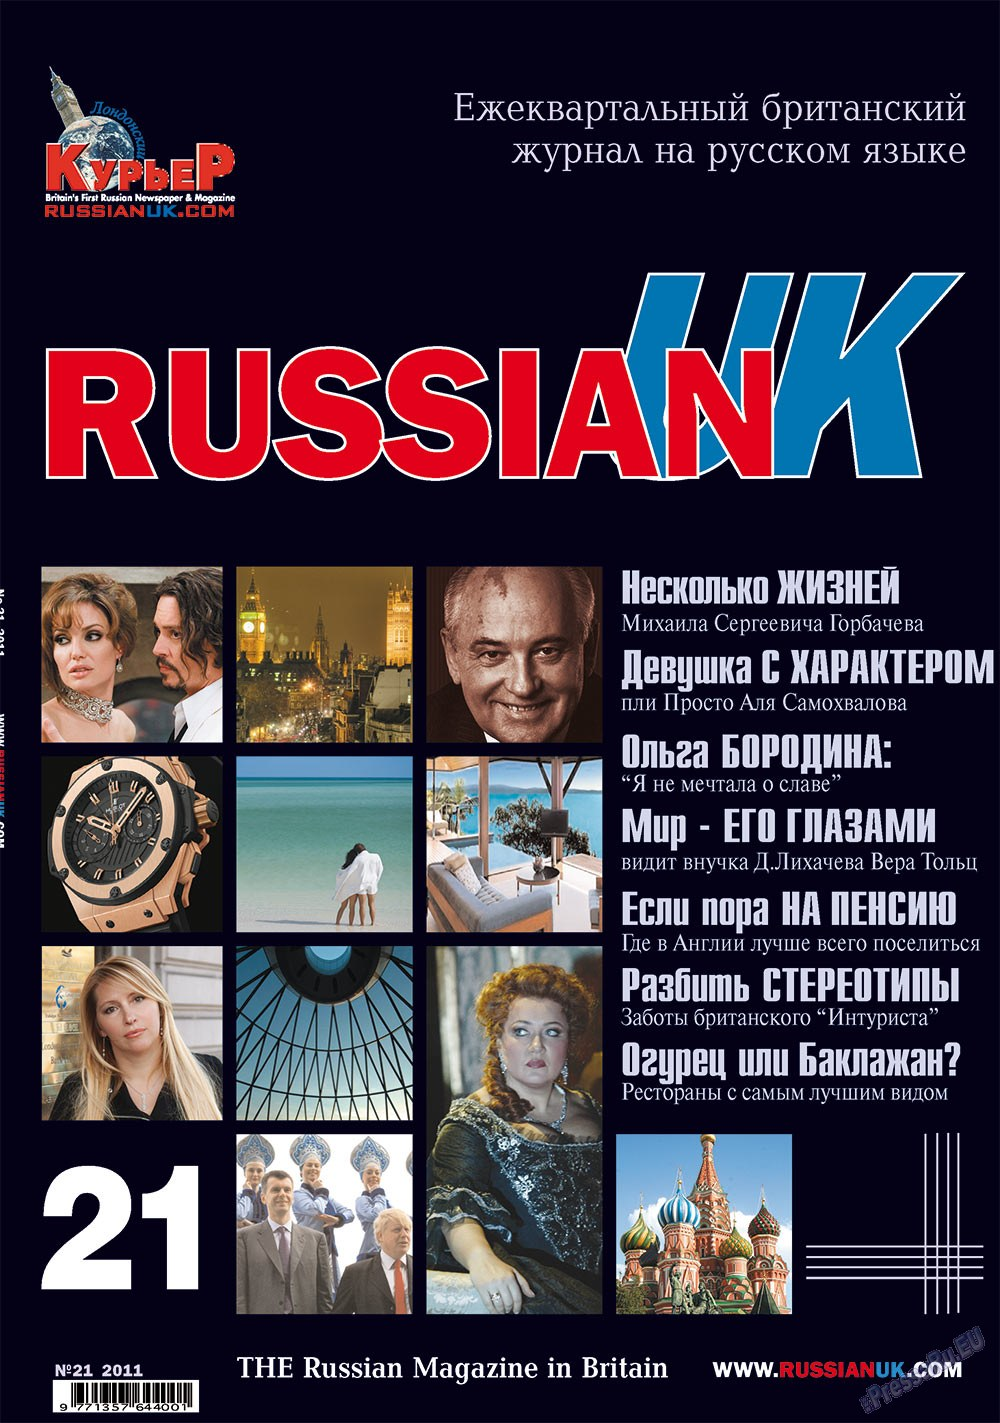 RussianUK (журнал). 2011 год, номер 21, стр. 1